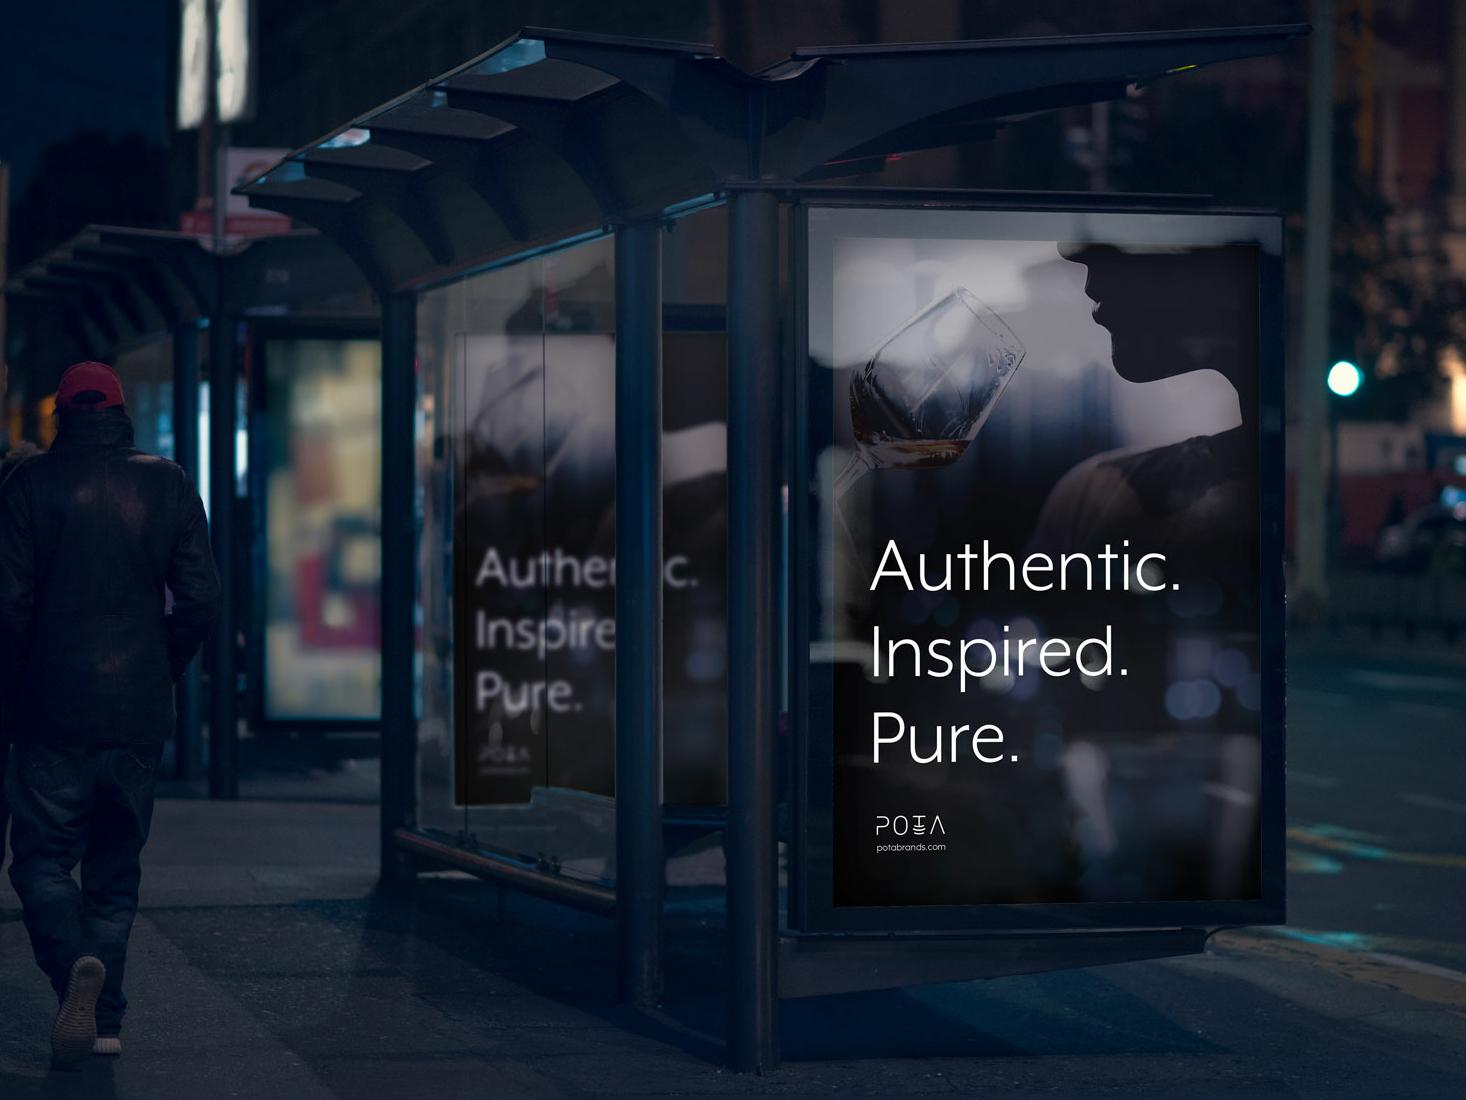 02 outdoor advertising mockup vol.2